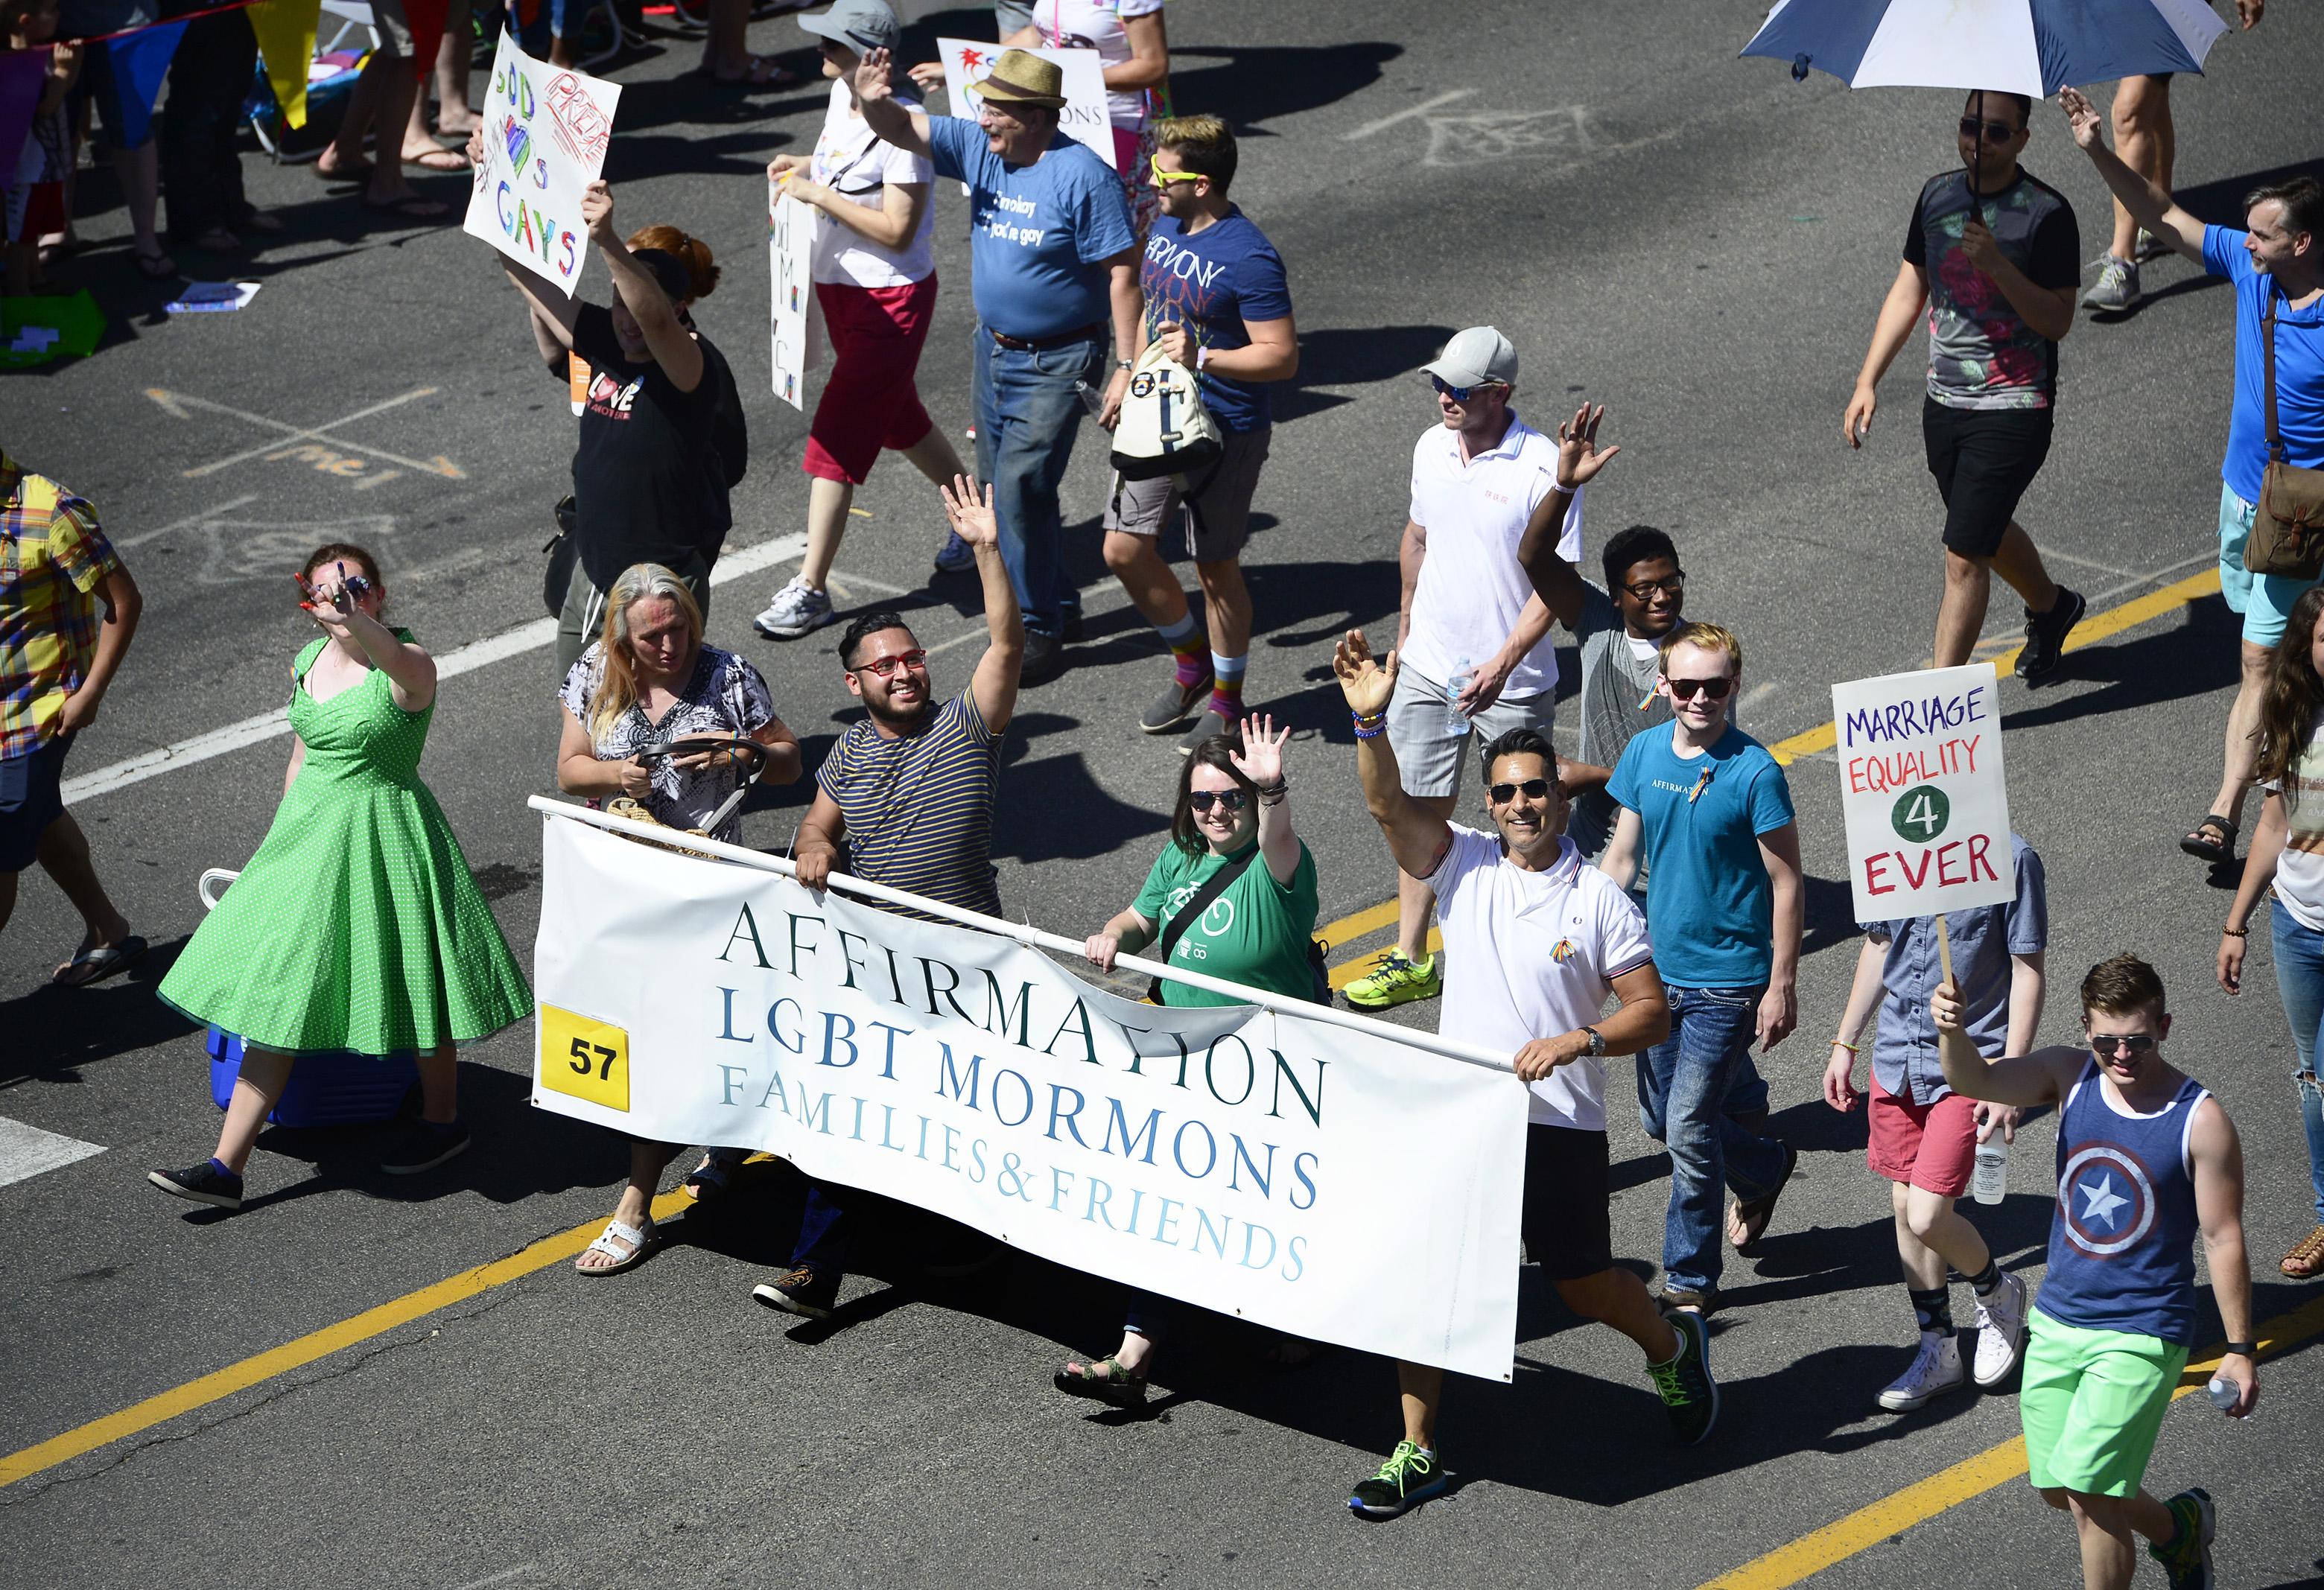 Scott Sommerdorf   |  The Salt Lake Tribune   Affirmation LGBT Mormons march during the 2016 Pride Parade on Sunday, June 5, 2016, in Salt Lake City.